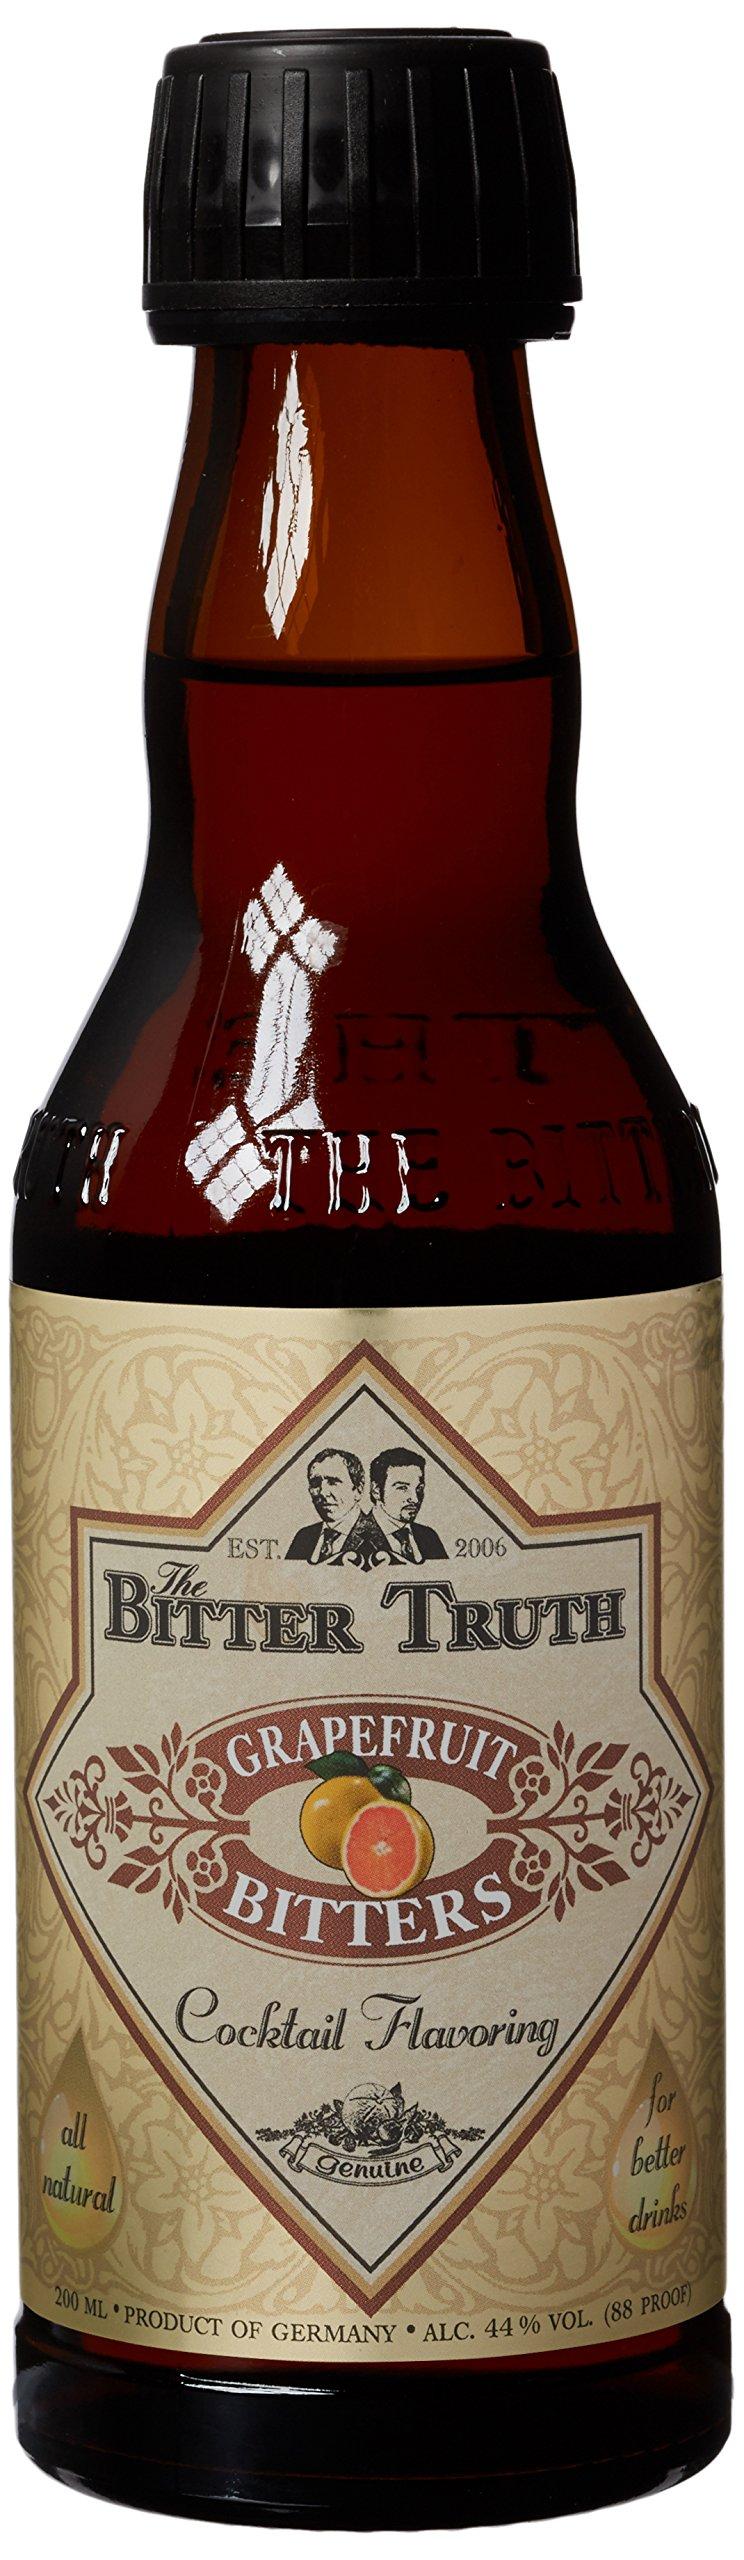 The Bitter Truth Grapefruit Bitters Not